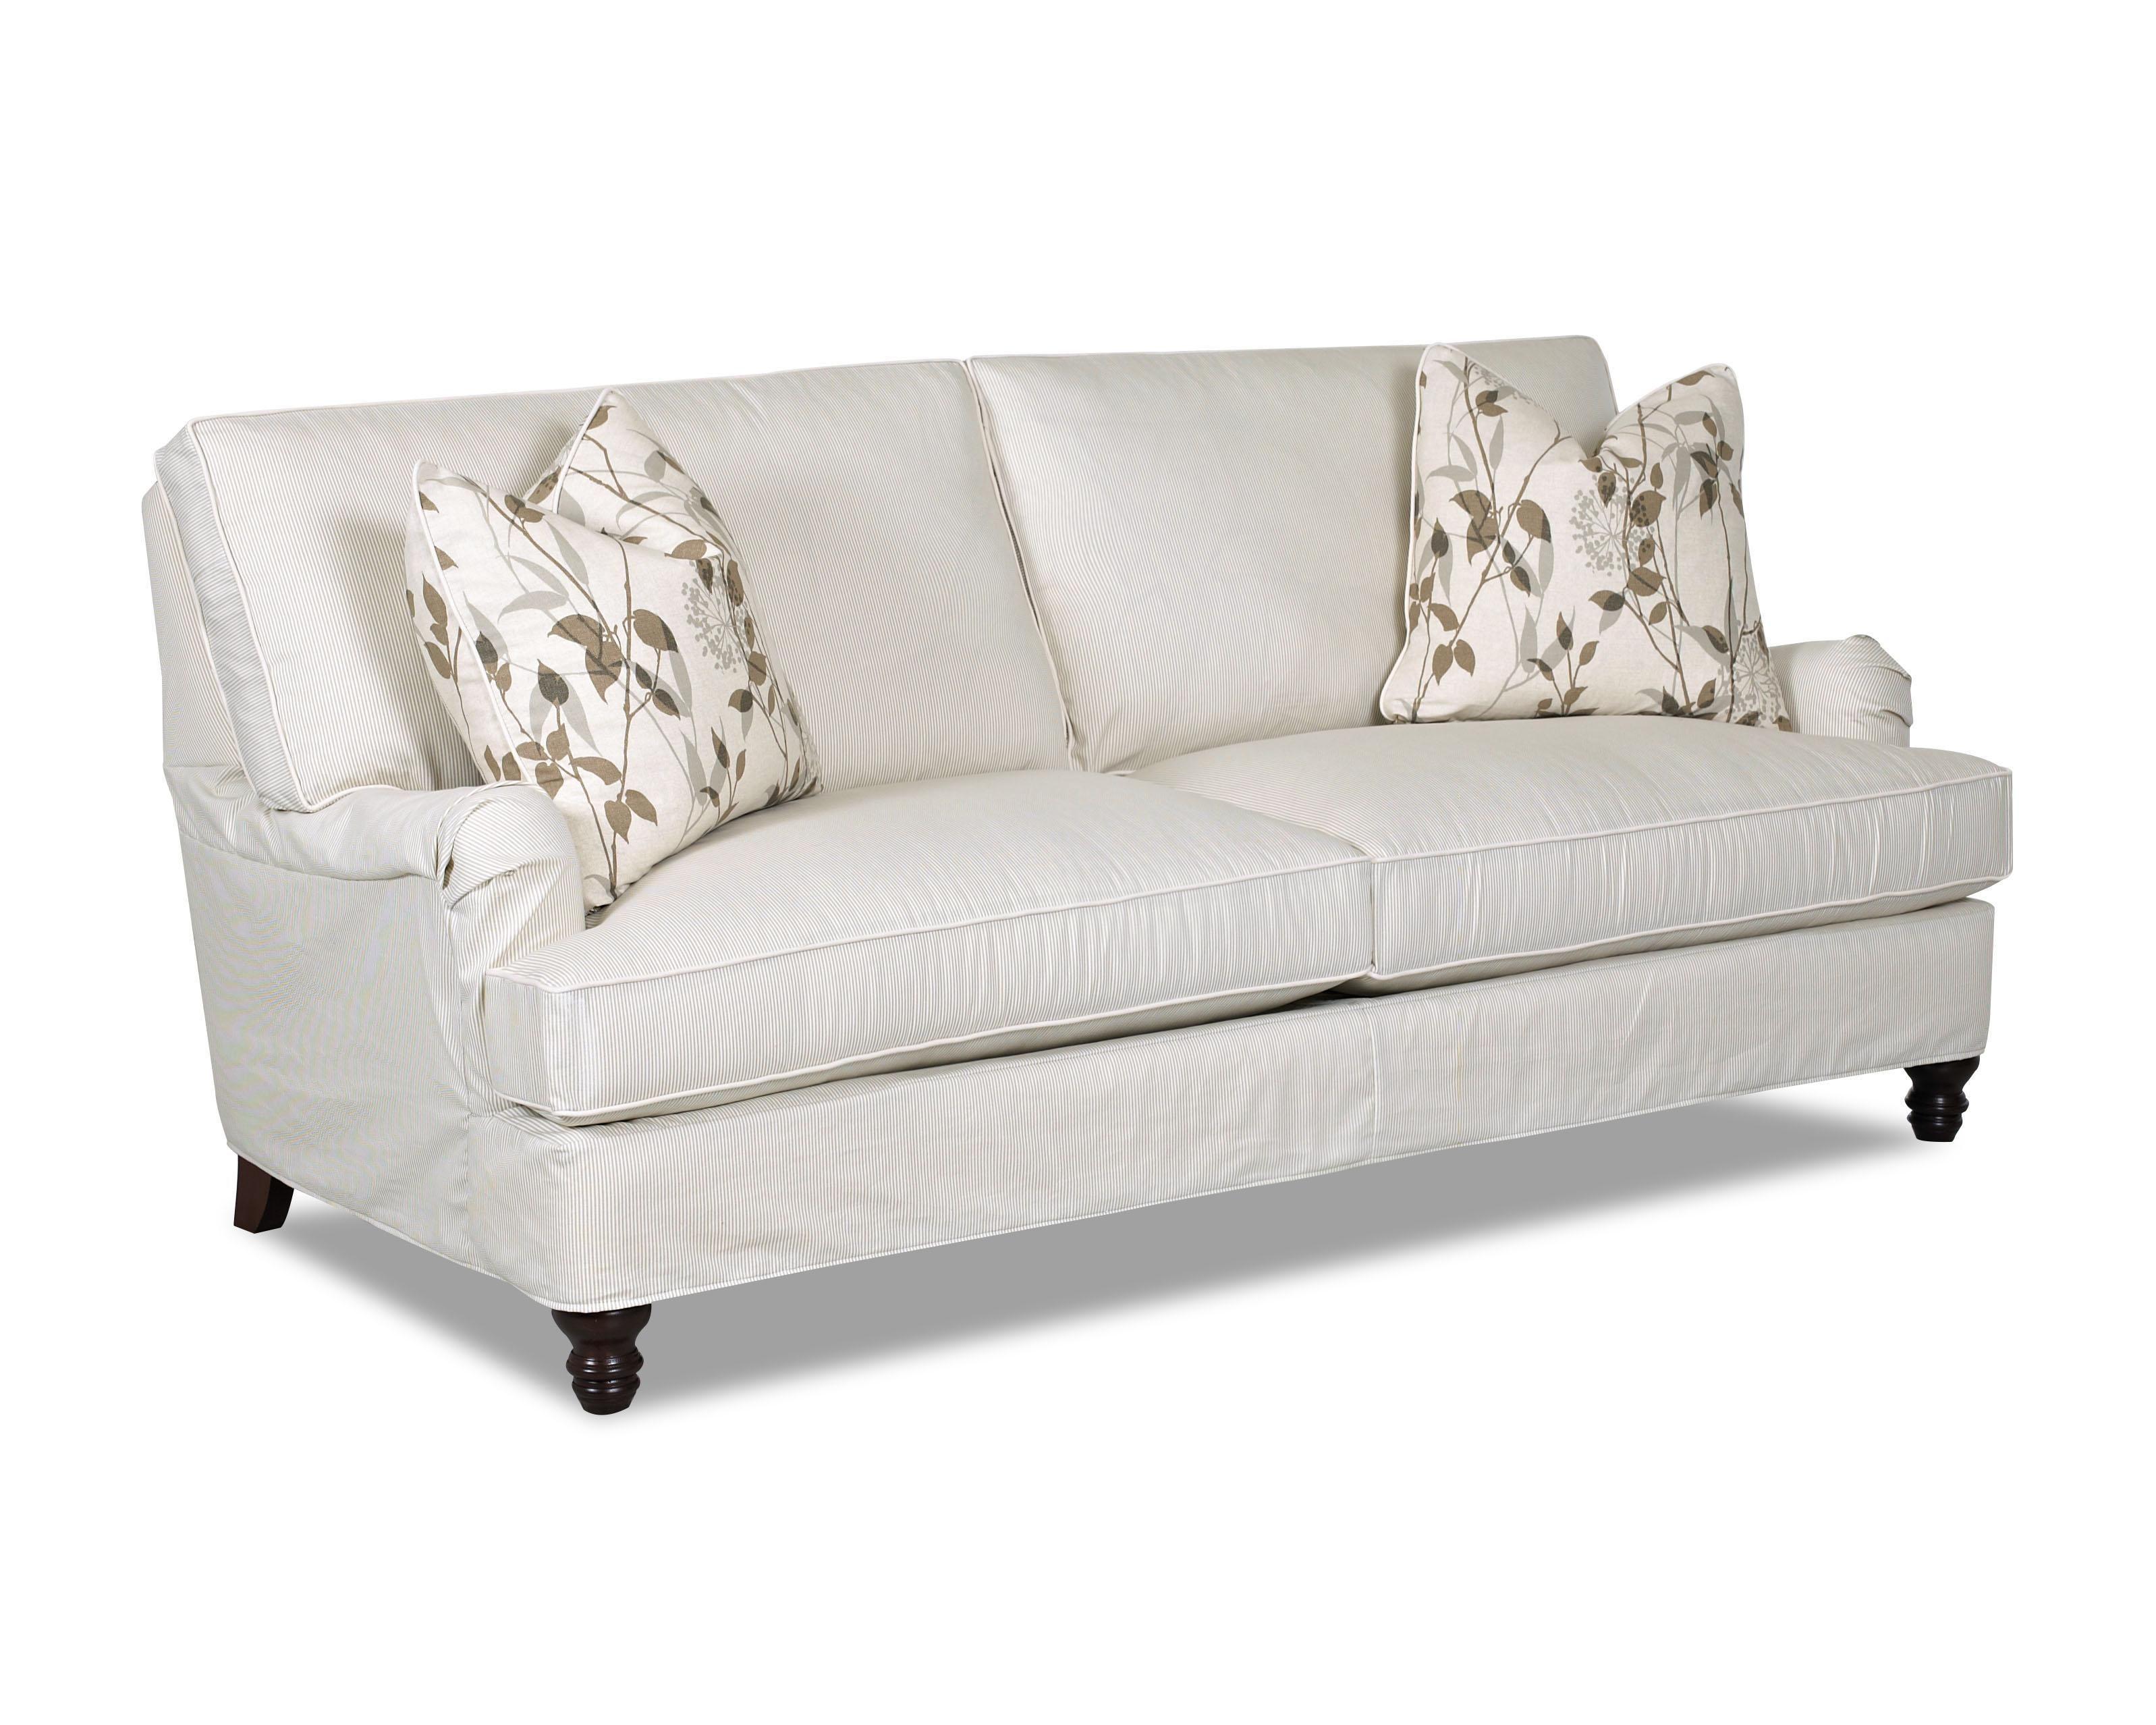 loewy sofa by klaussner baltimore pinterest simple elegance